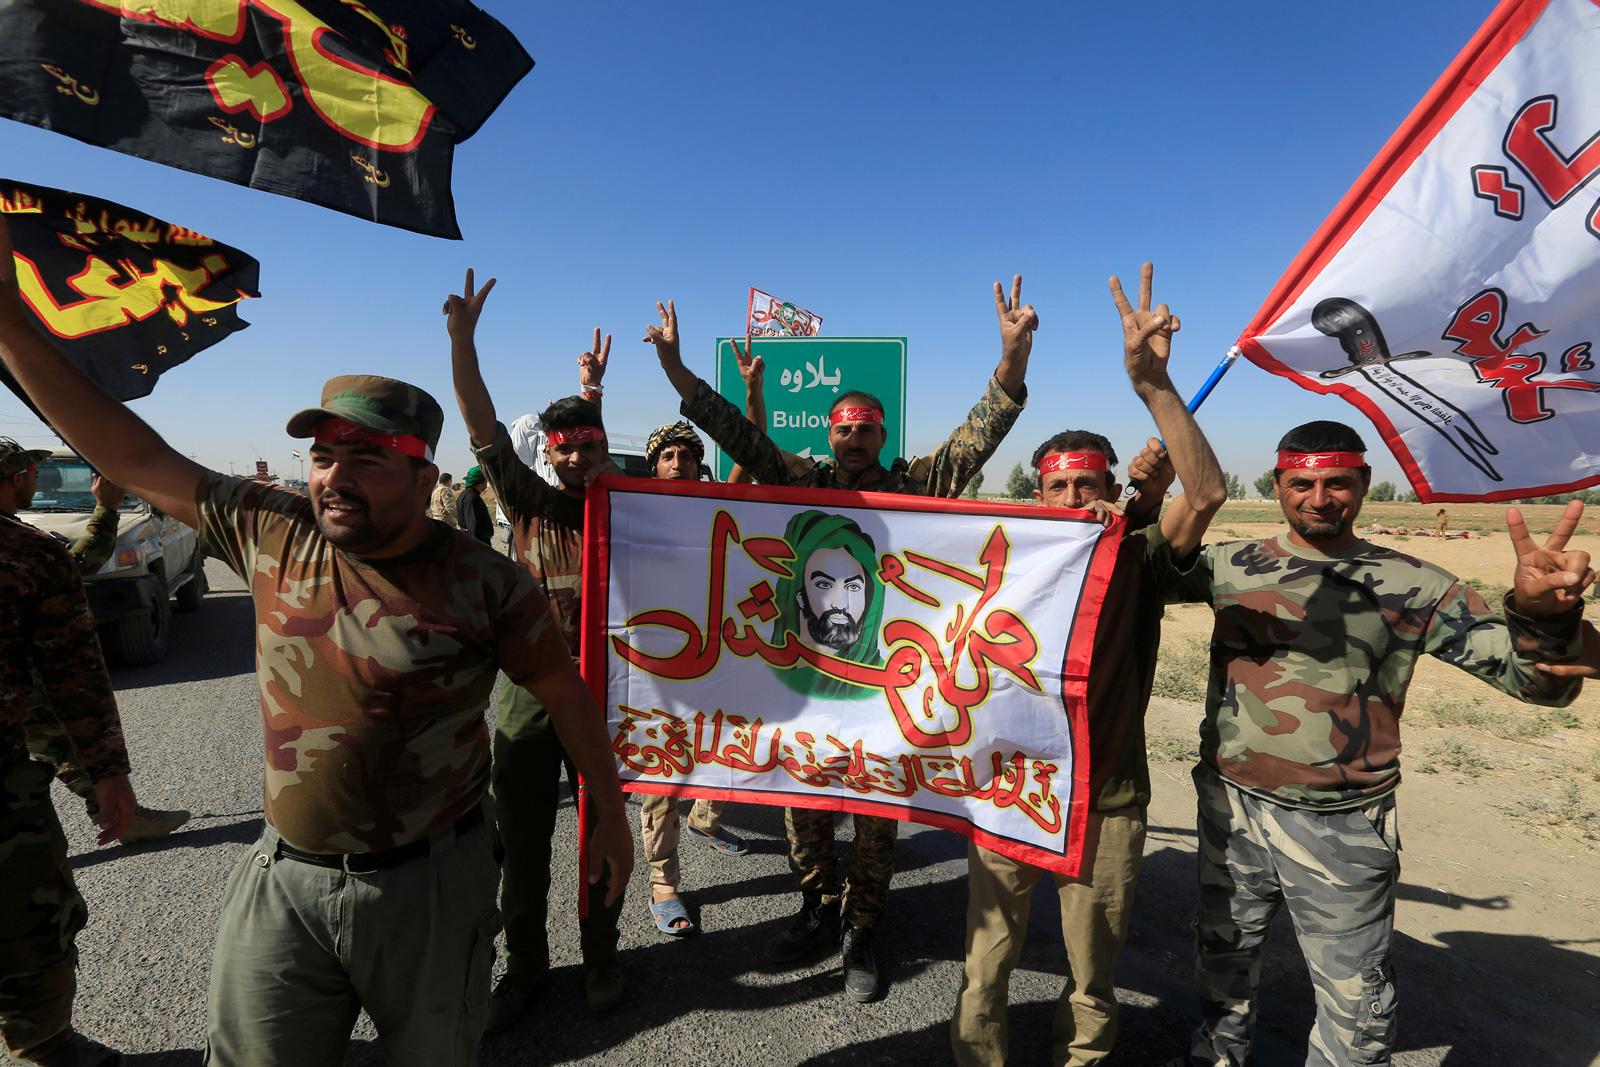 Shiite militiamen celebrating their advance into Kurdish-held Iraqi territory near Kirkuk, October 17, 2017